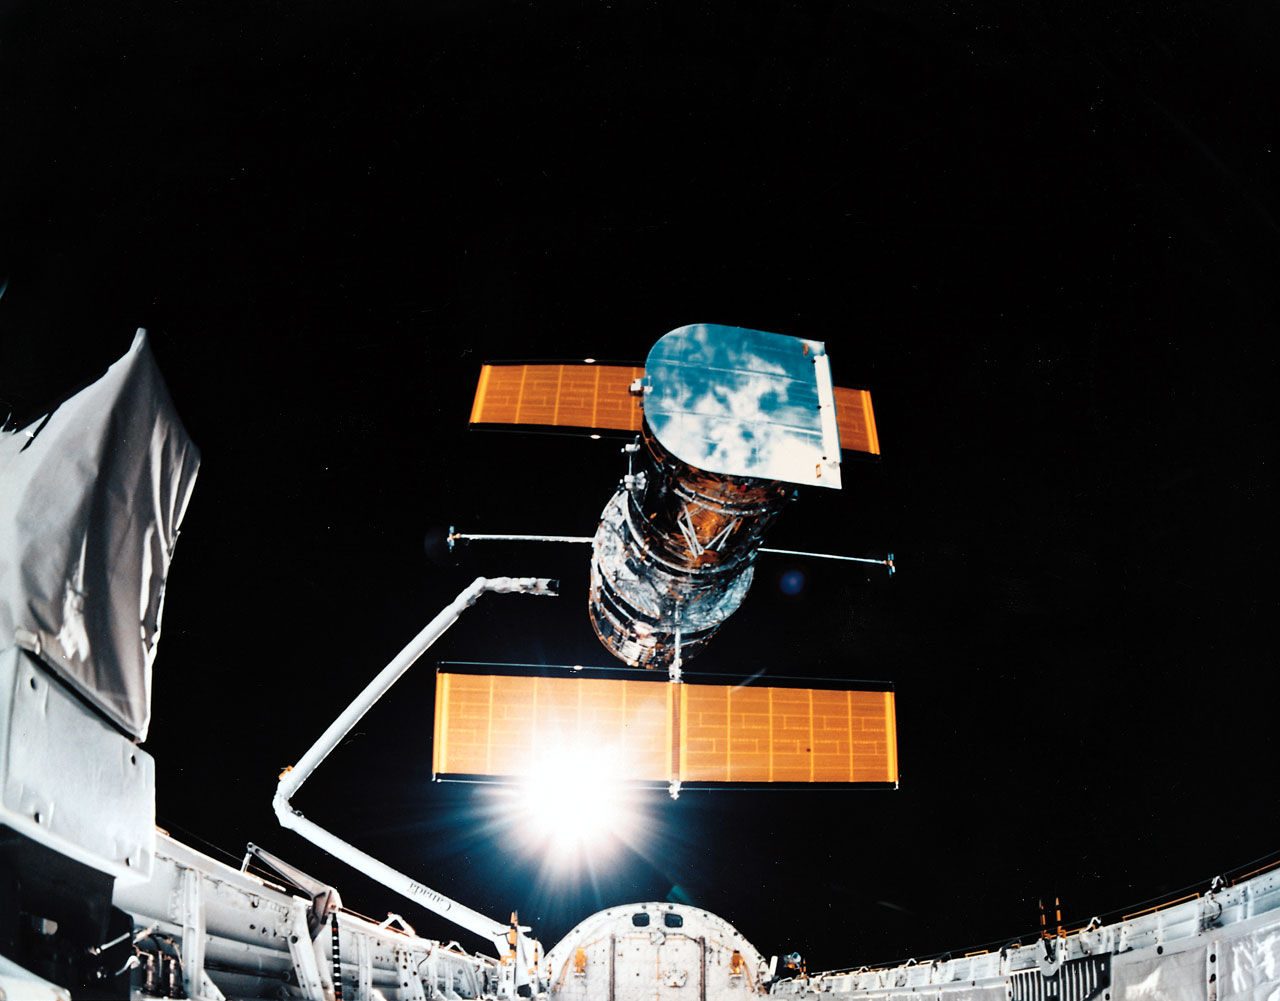 HUBBLE SPACE TELESCOPE DISCOVERIES « Optics & Binoculars